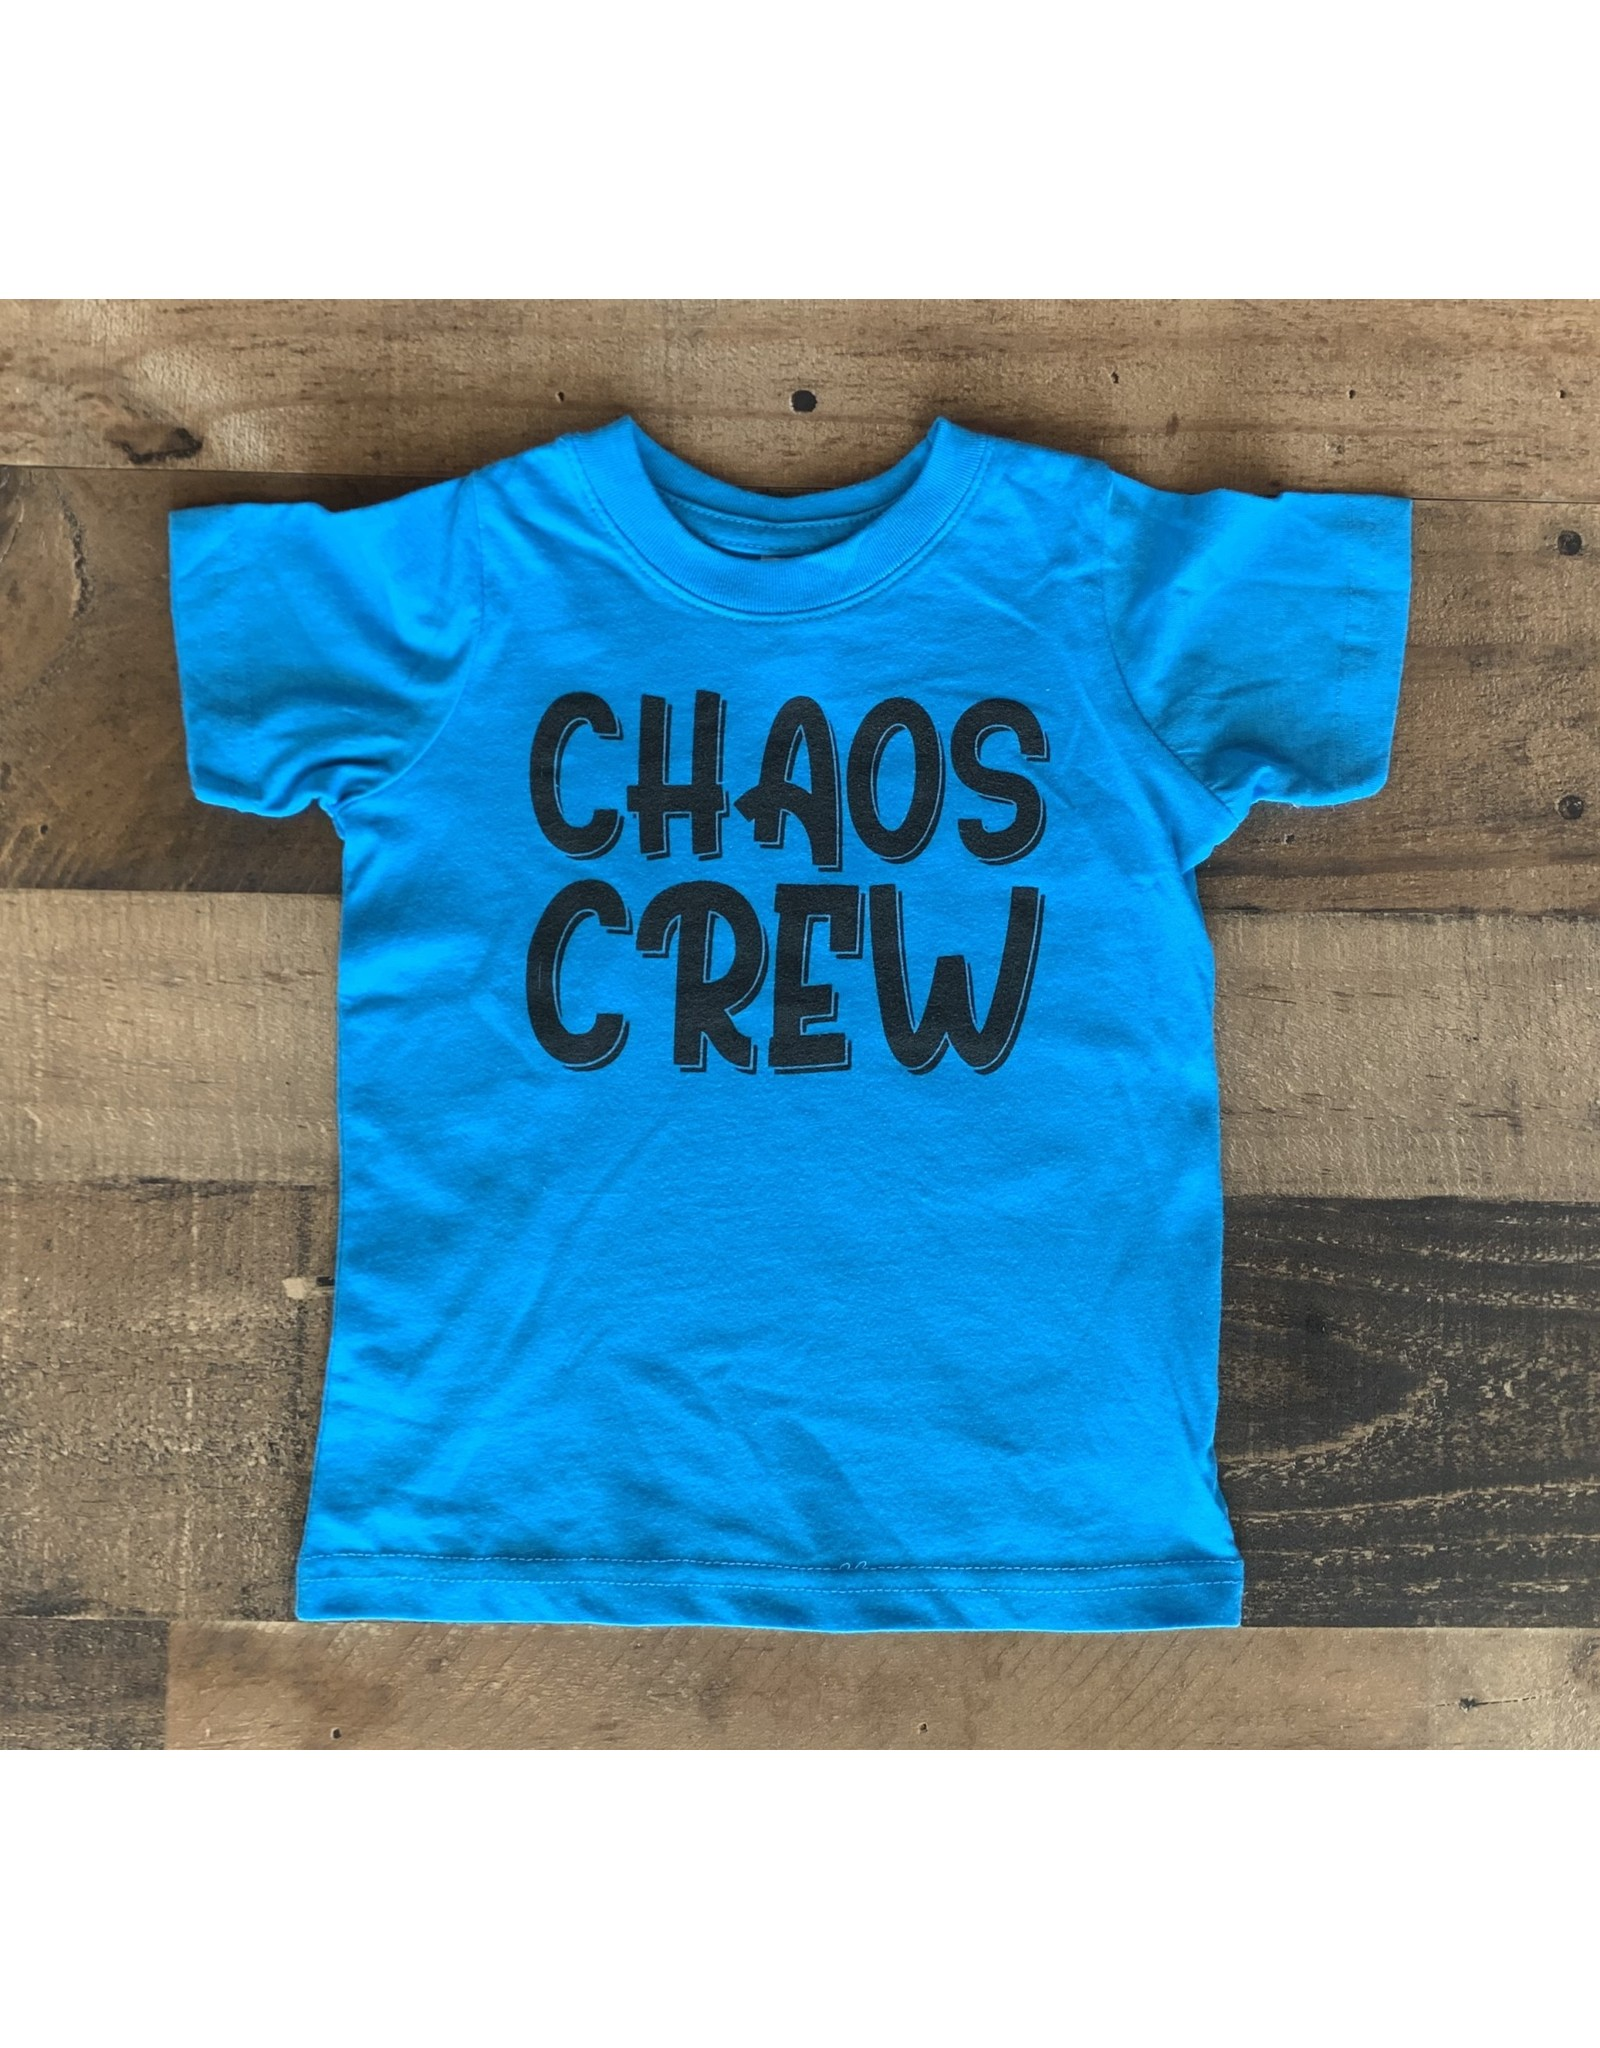 Chaos Crew Shirt: Turquoise